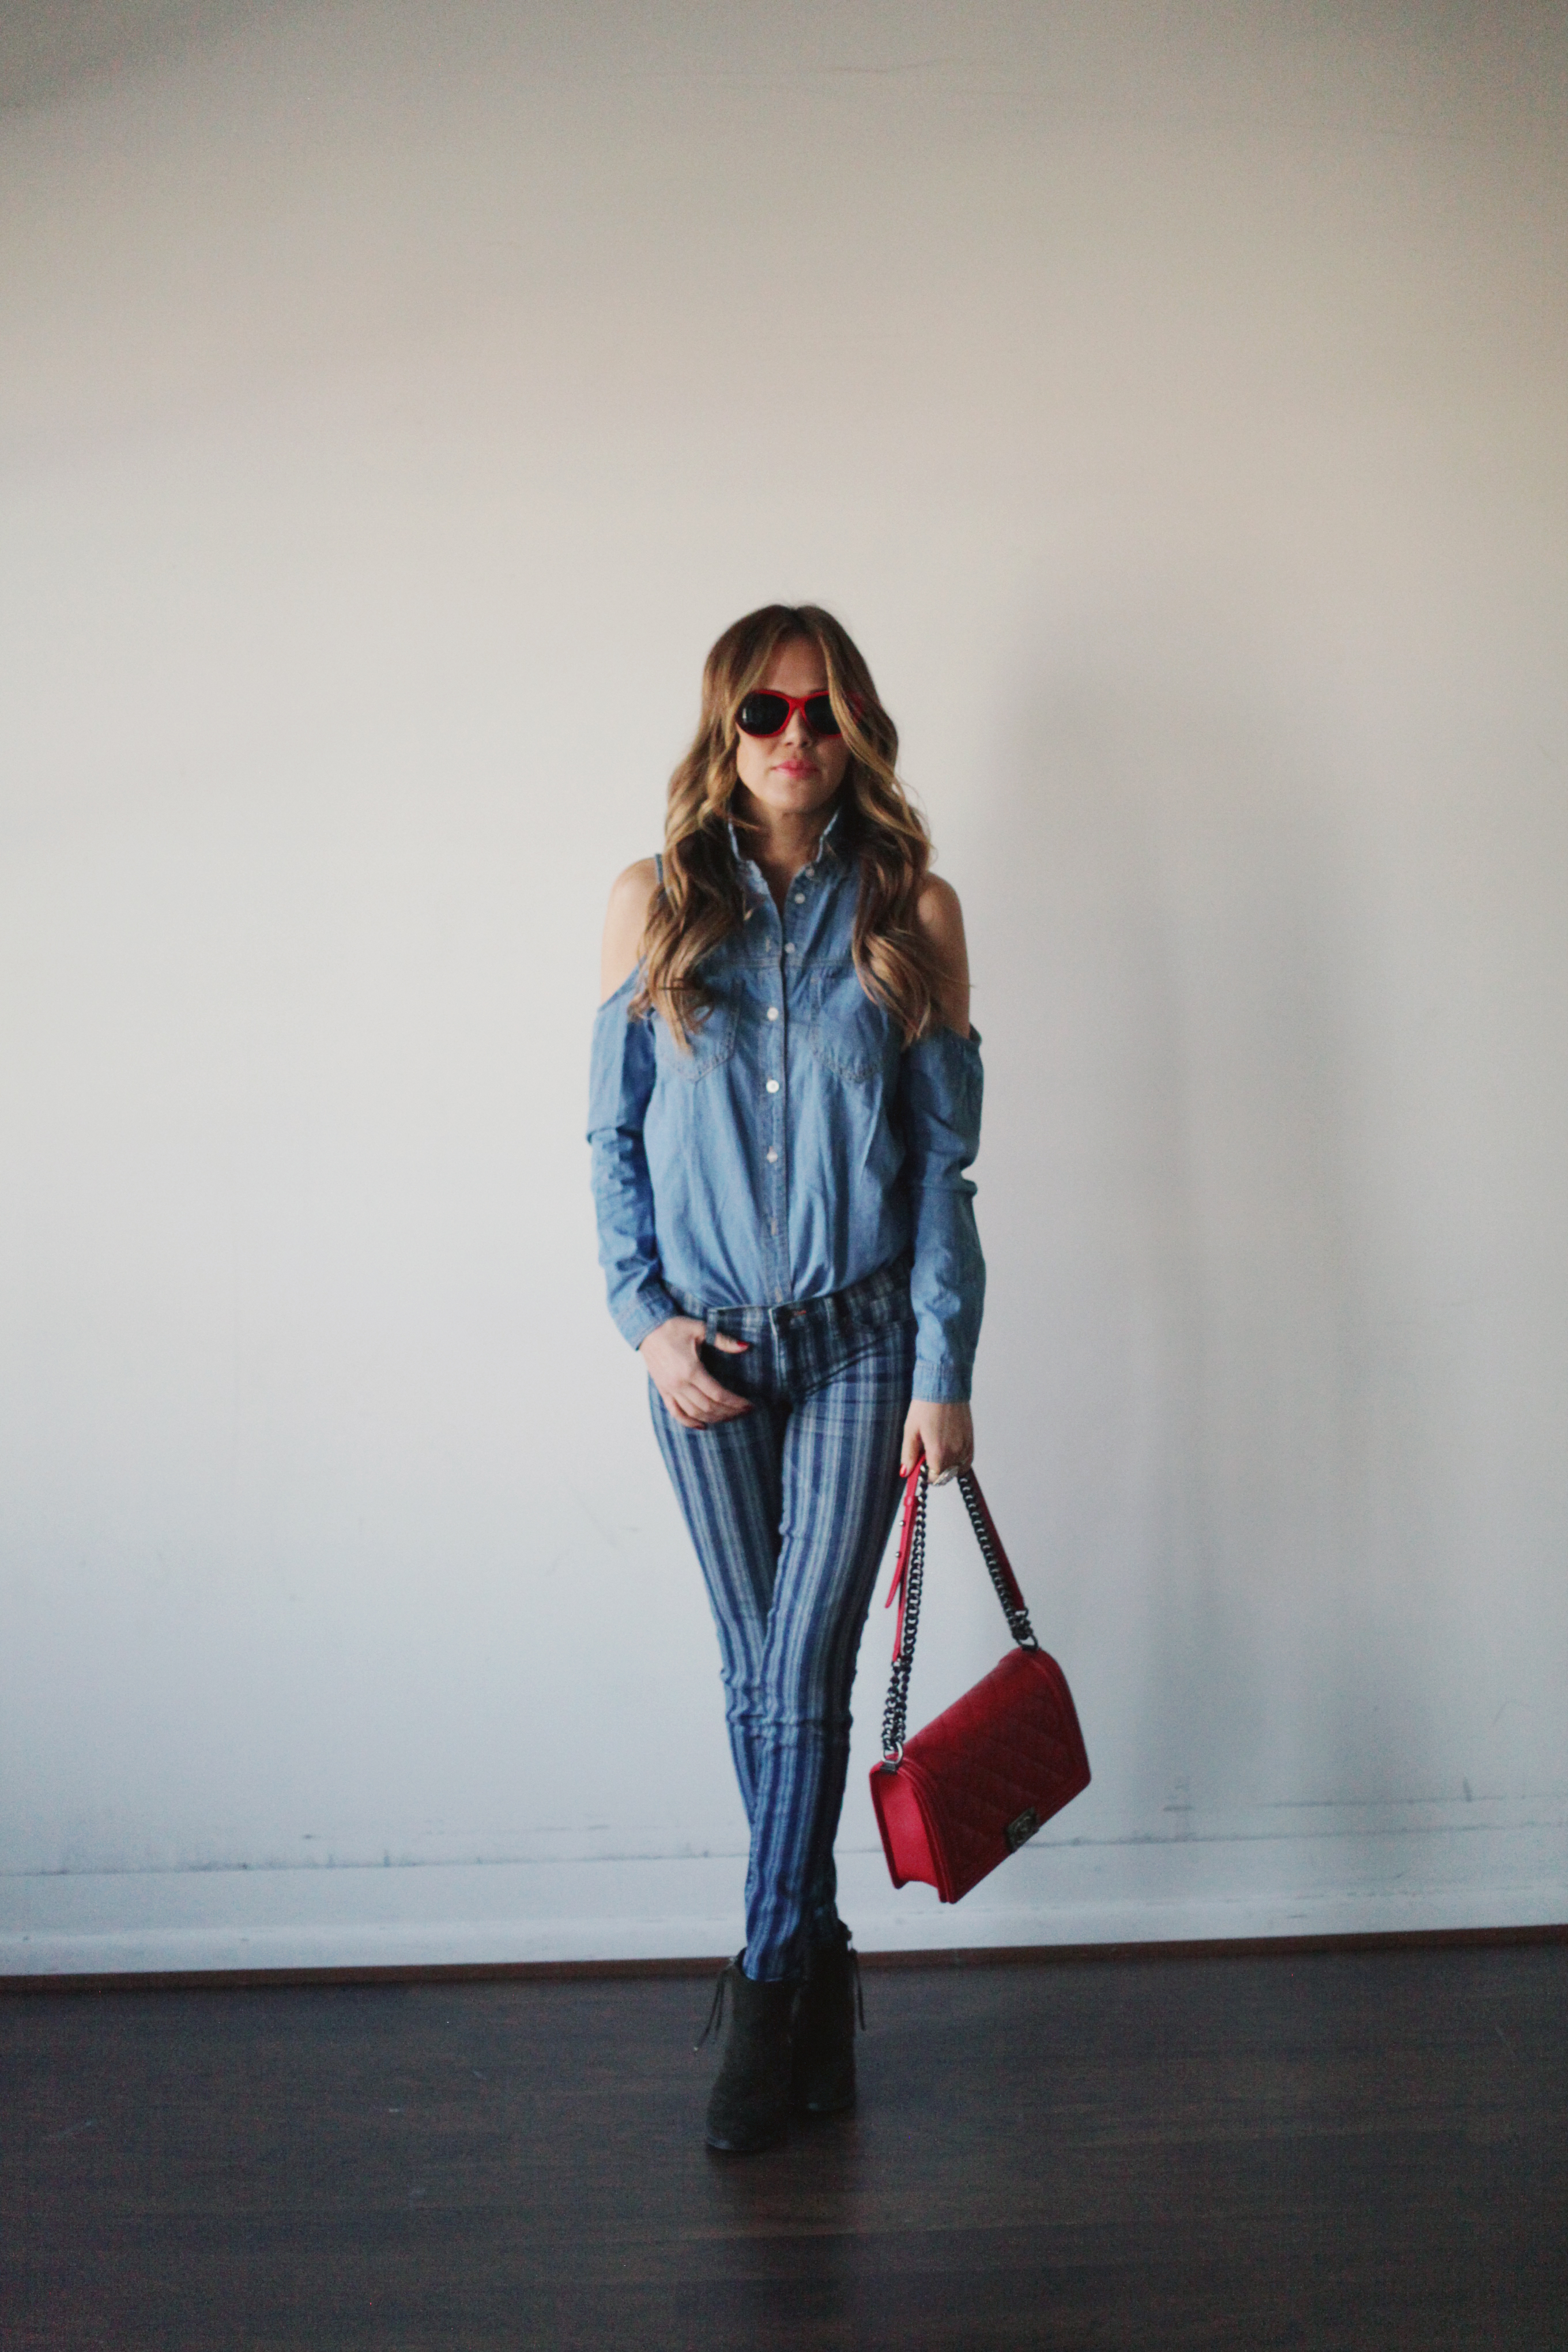 Fashion Fuse Clothing: Denim On Denim • The Fashion Fuse